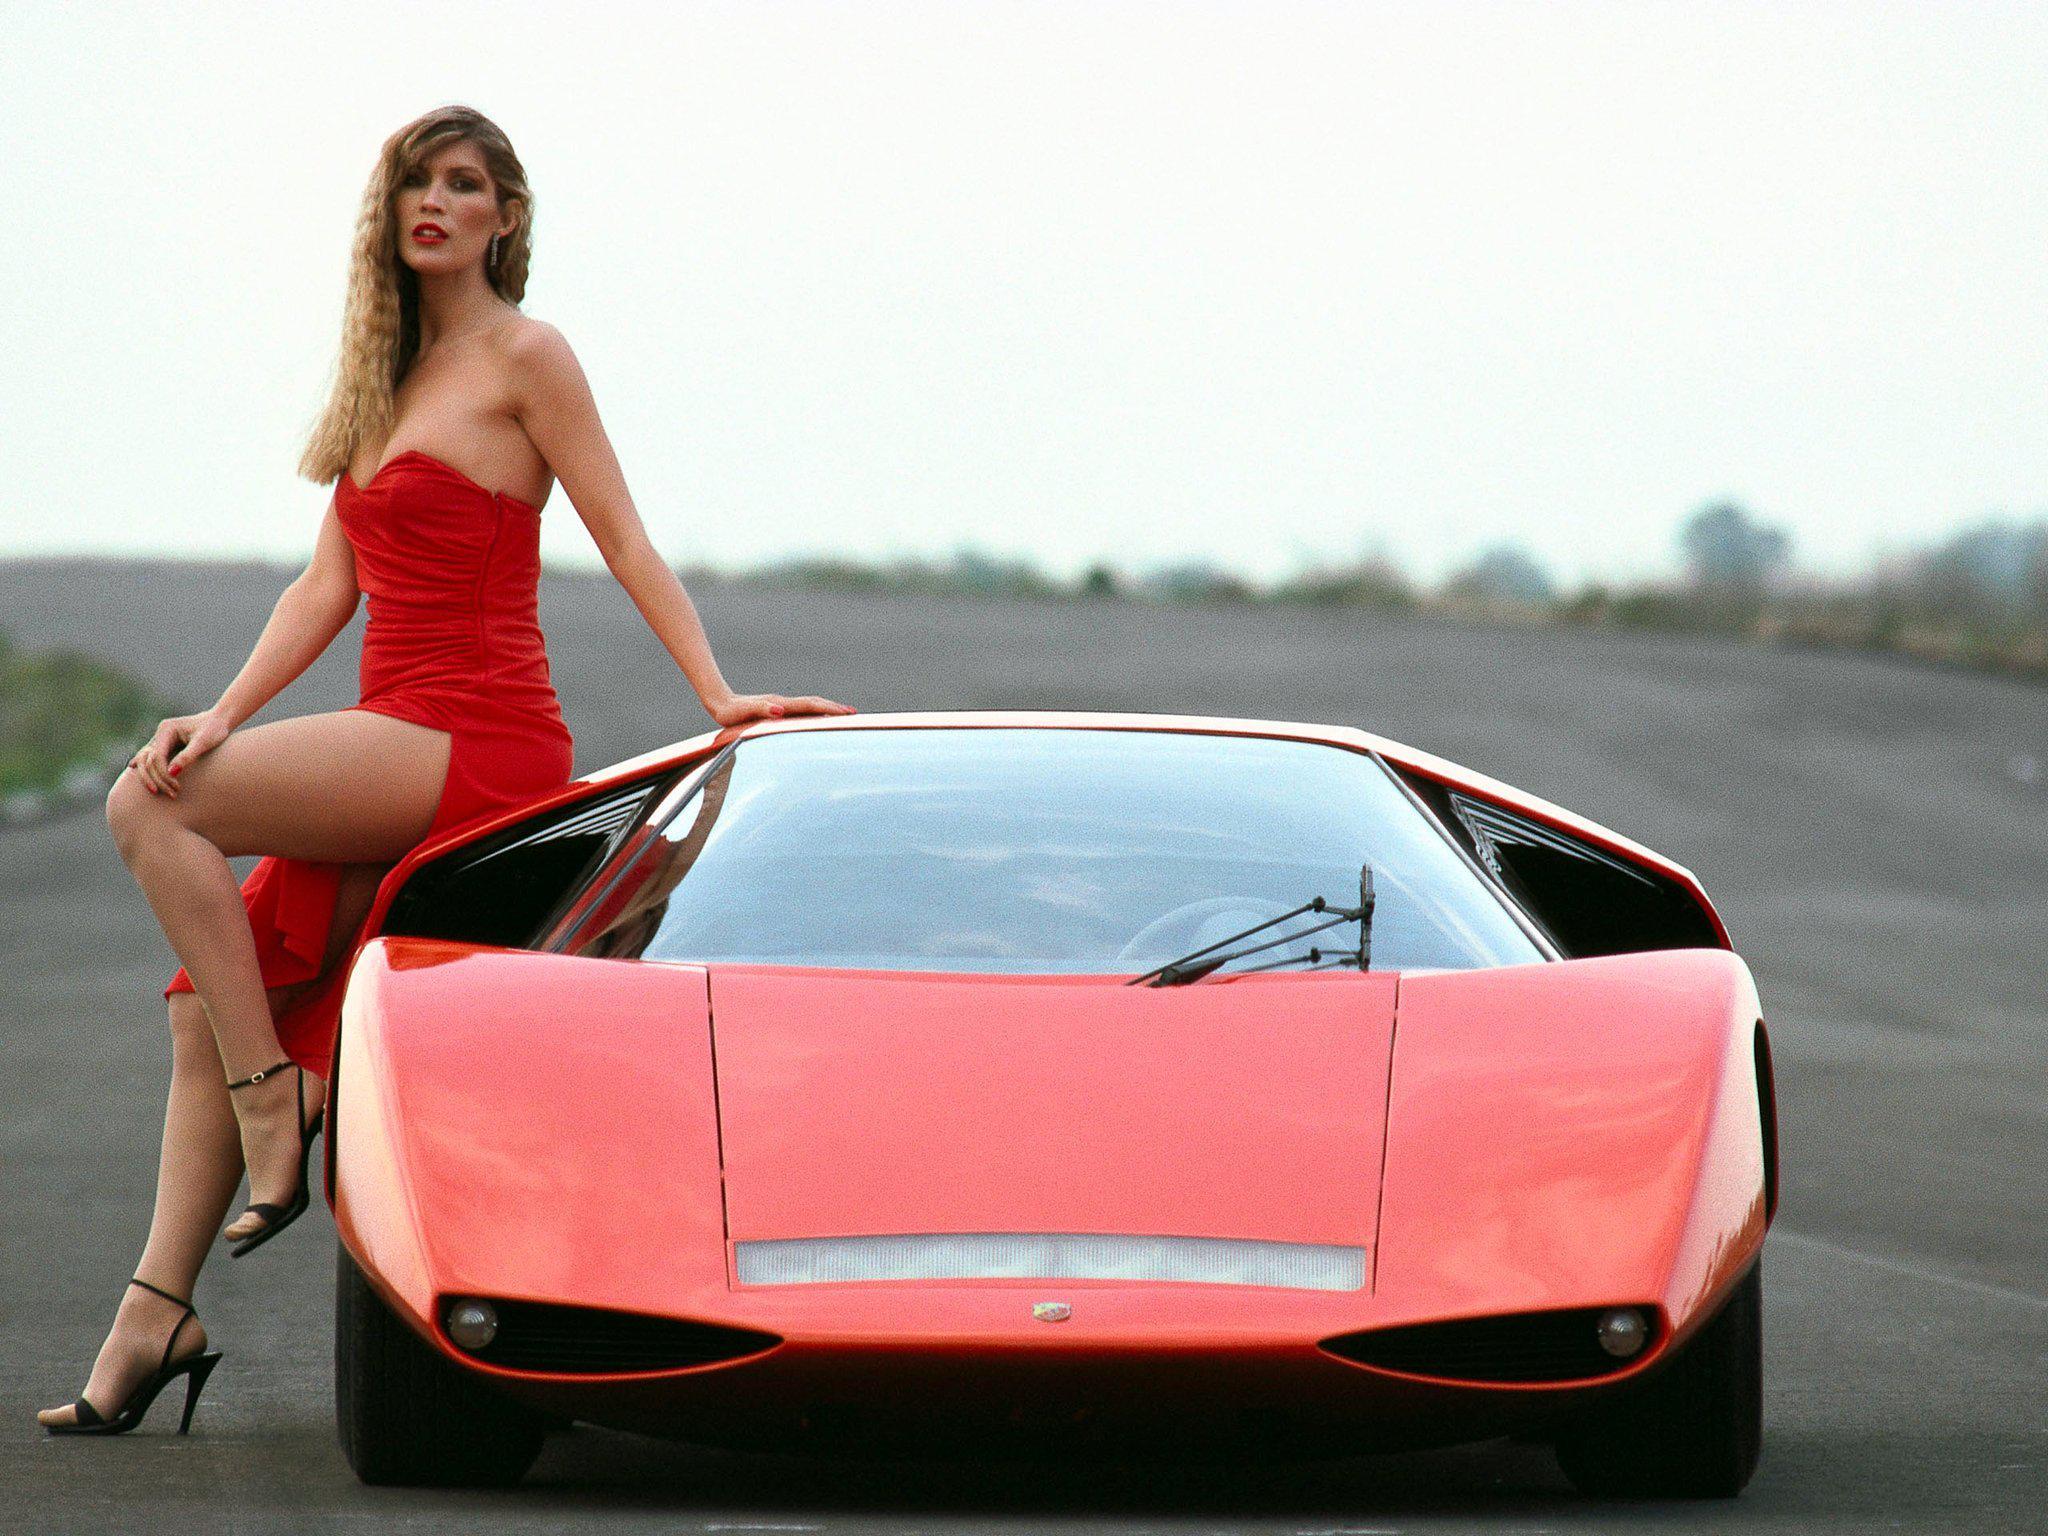 Scorpio Car Wallpaper Hd 1969 Fiat Abarth 2000 Scorpio Supercar Race Racing